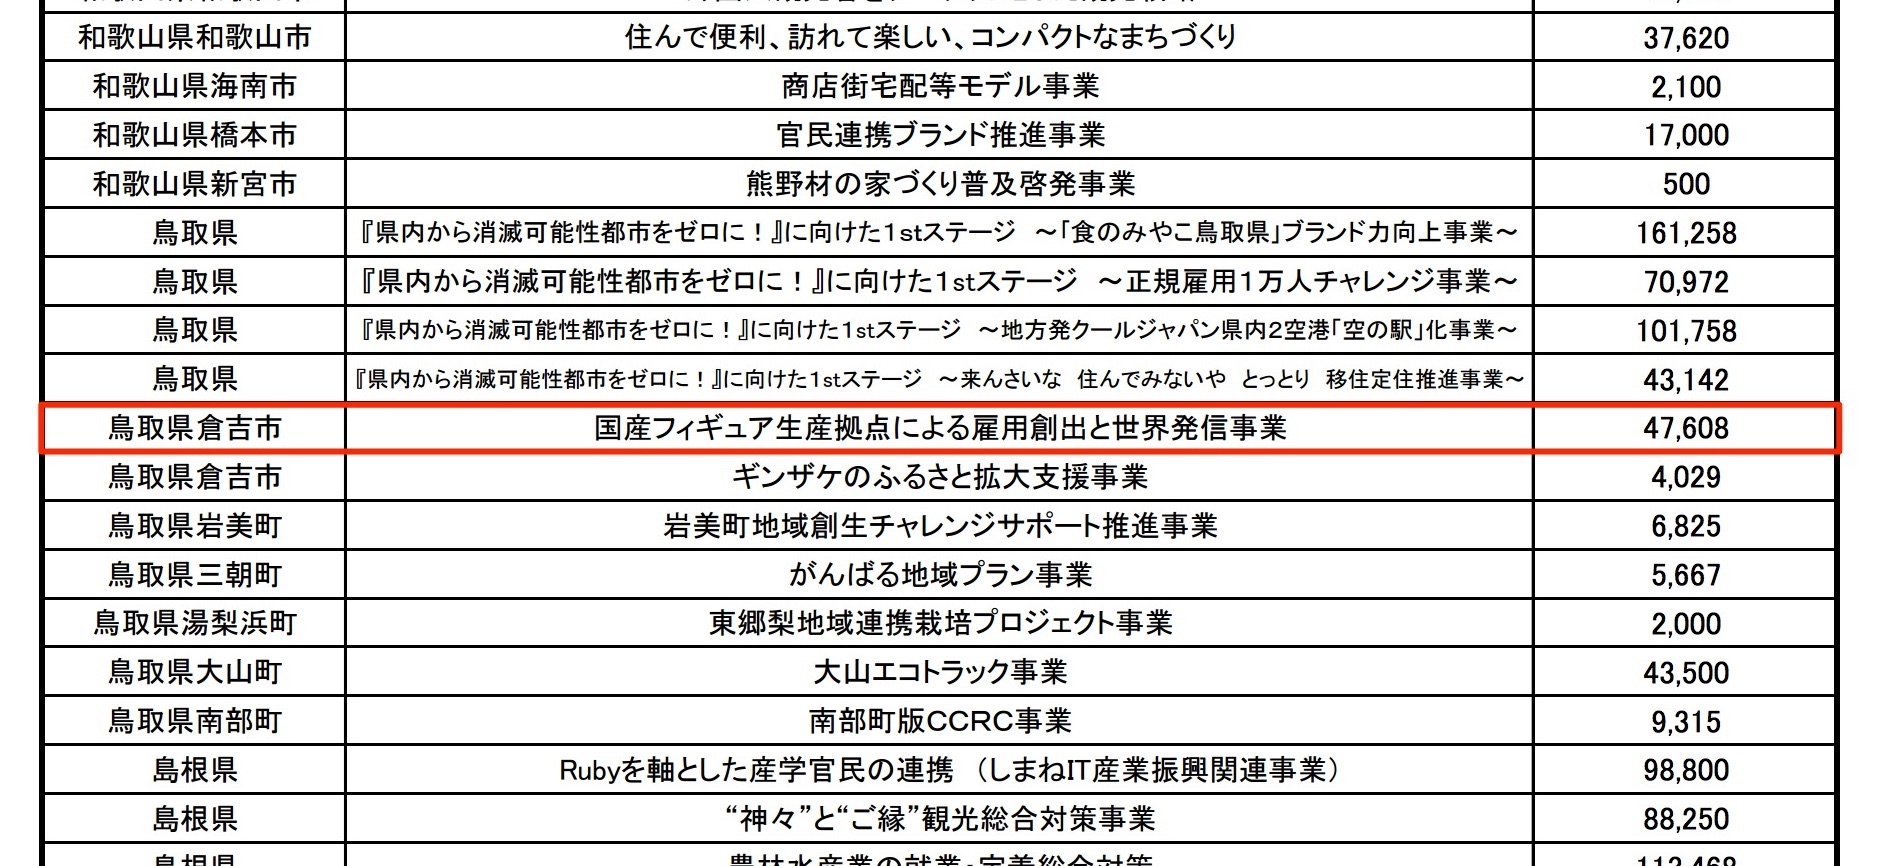 h27-11-10-uwanose-t.jpg